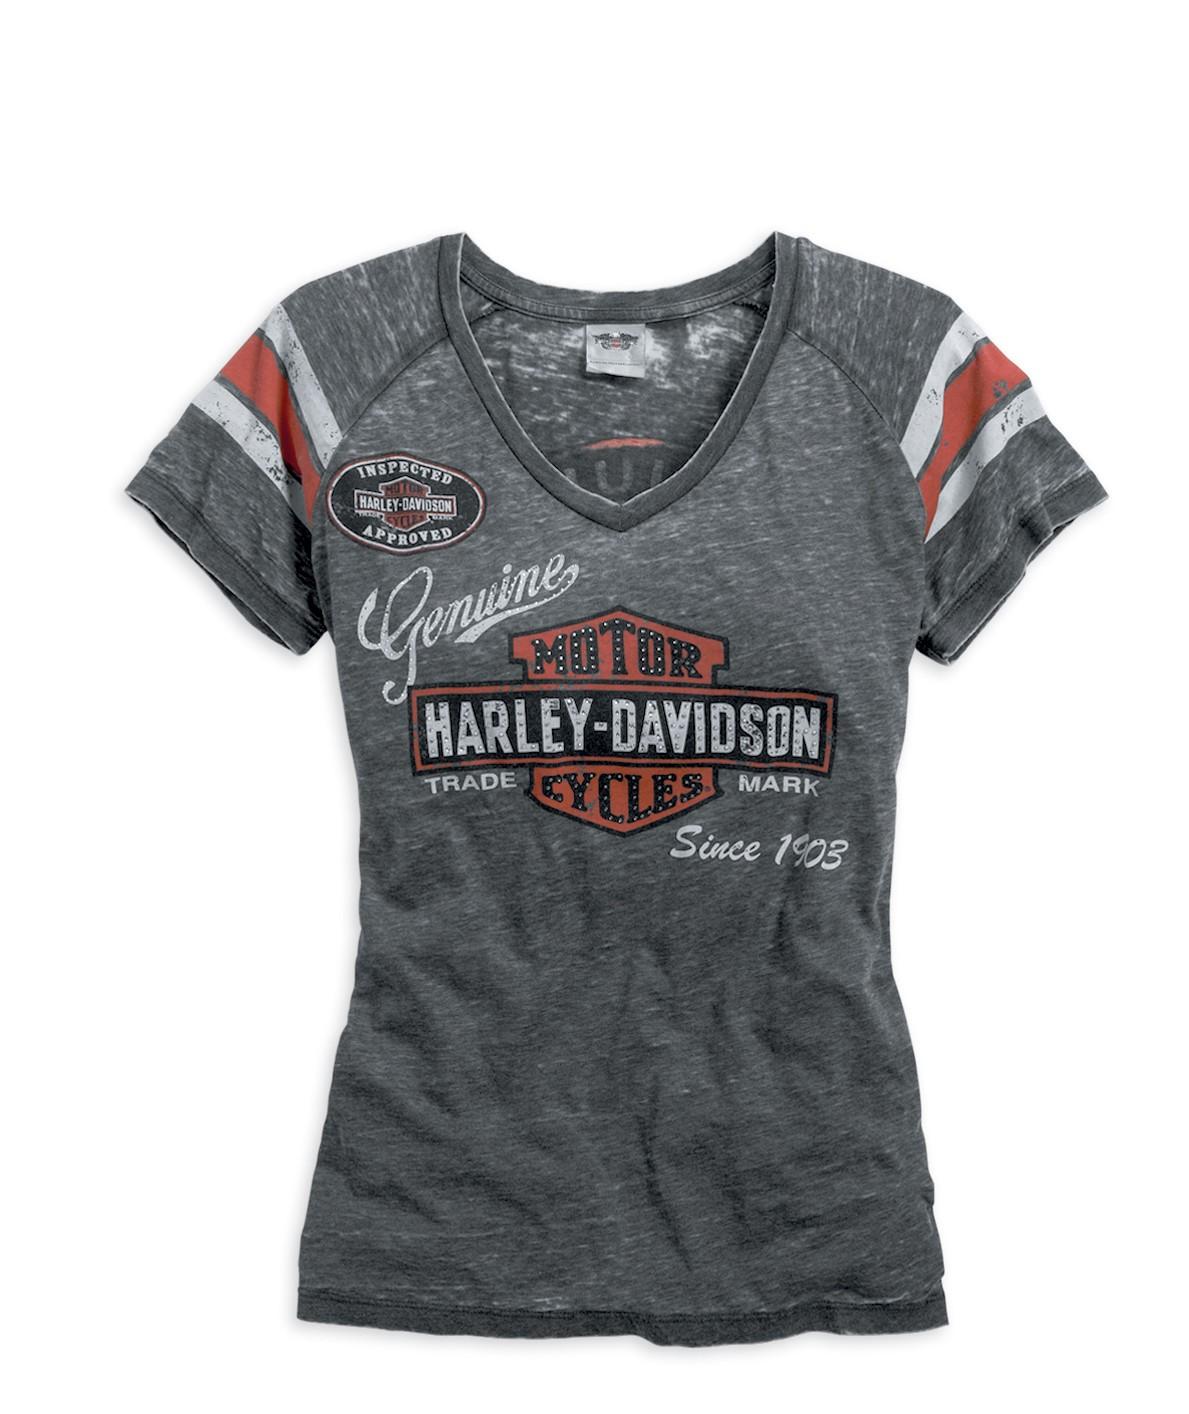 7a5e1dfb7d28 T-shirts Harley Davidson femme - Harley Davidson Le Mans